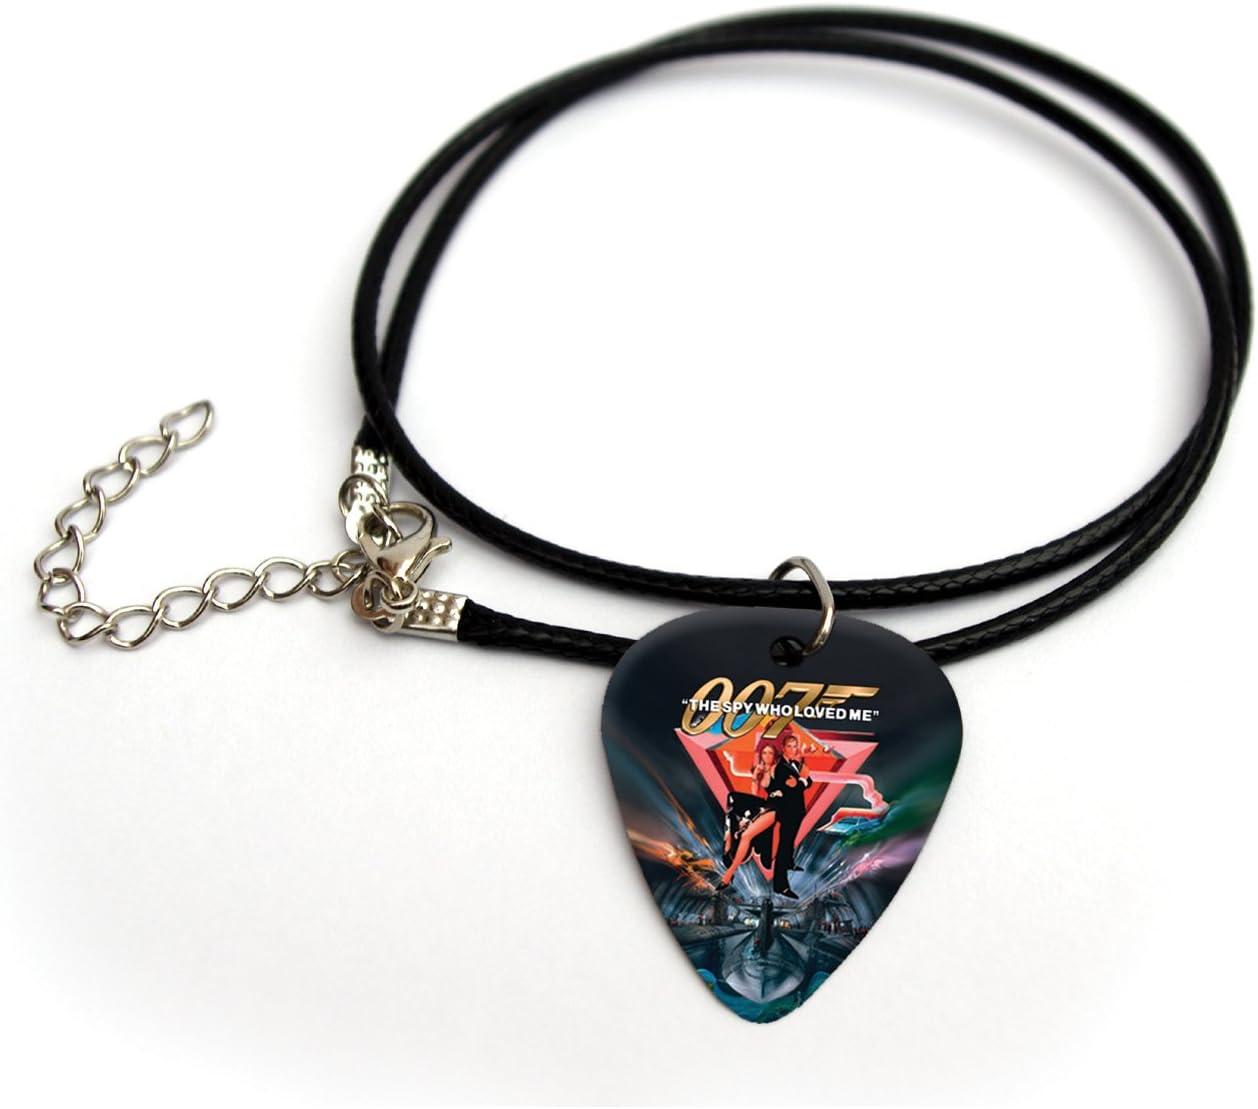 007 Collar de púa de guitarra impresa con el texto en inglés